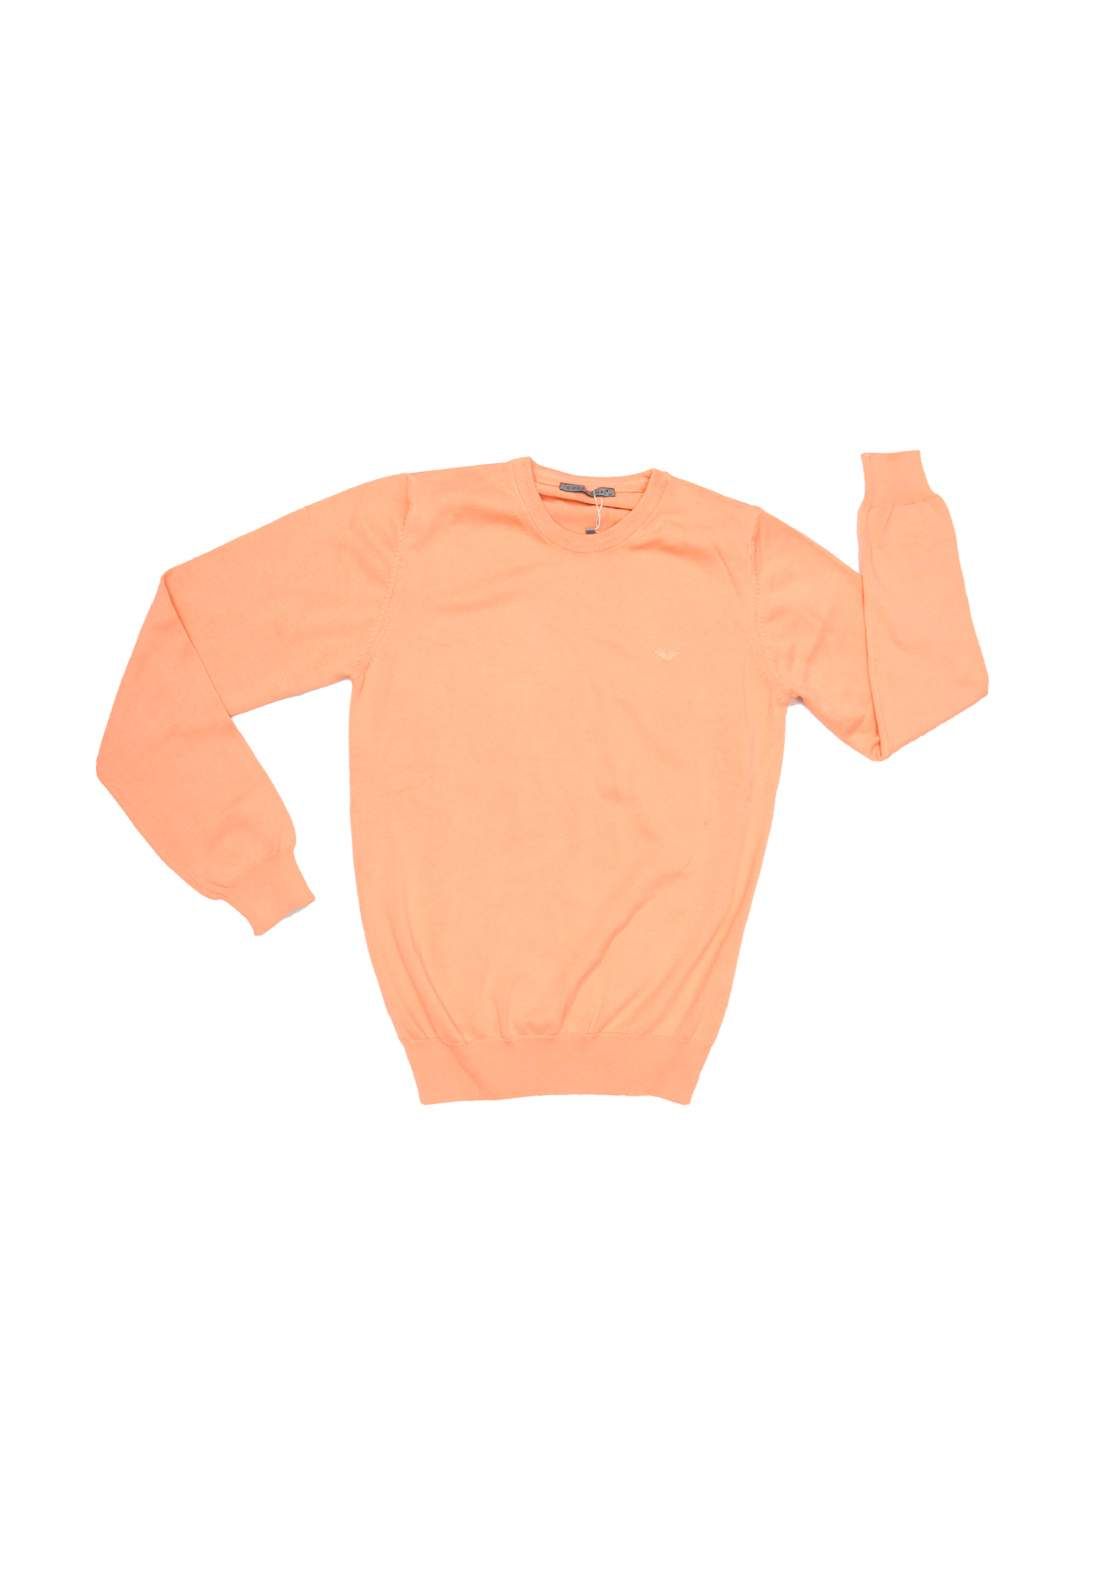 بلوز رجالي برتقالي اللون